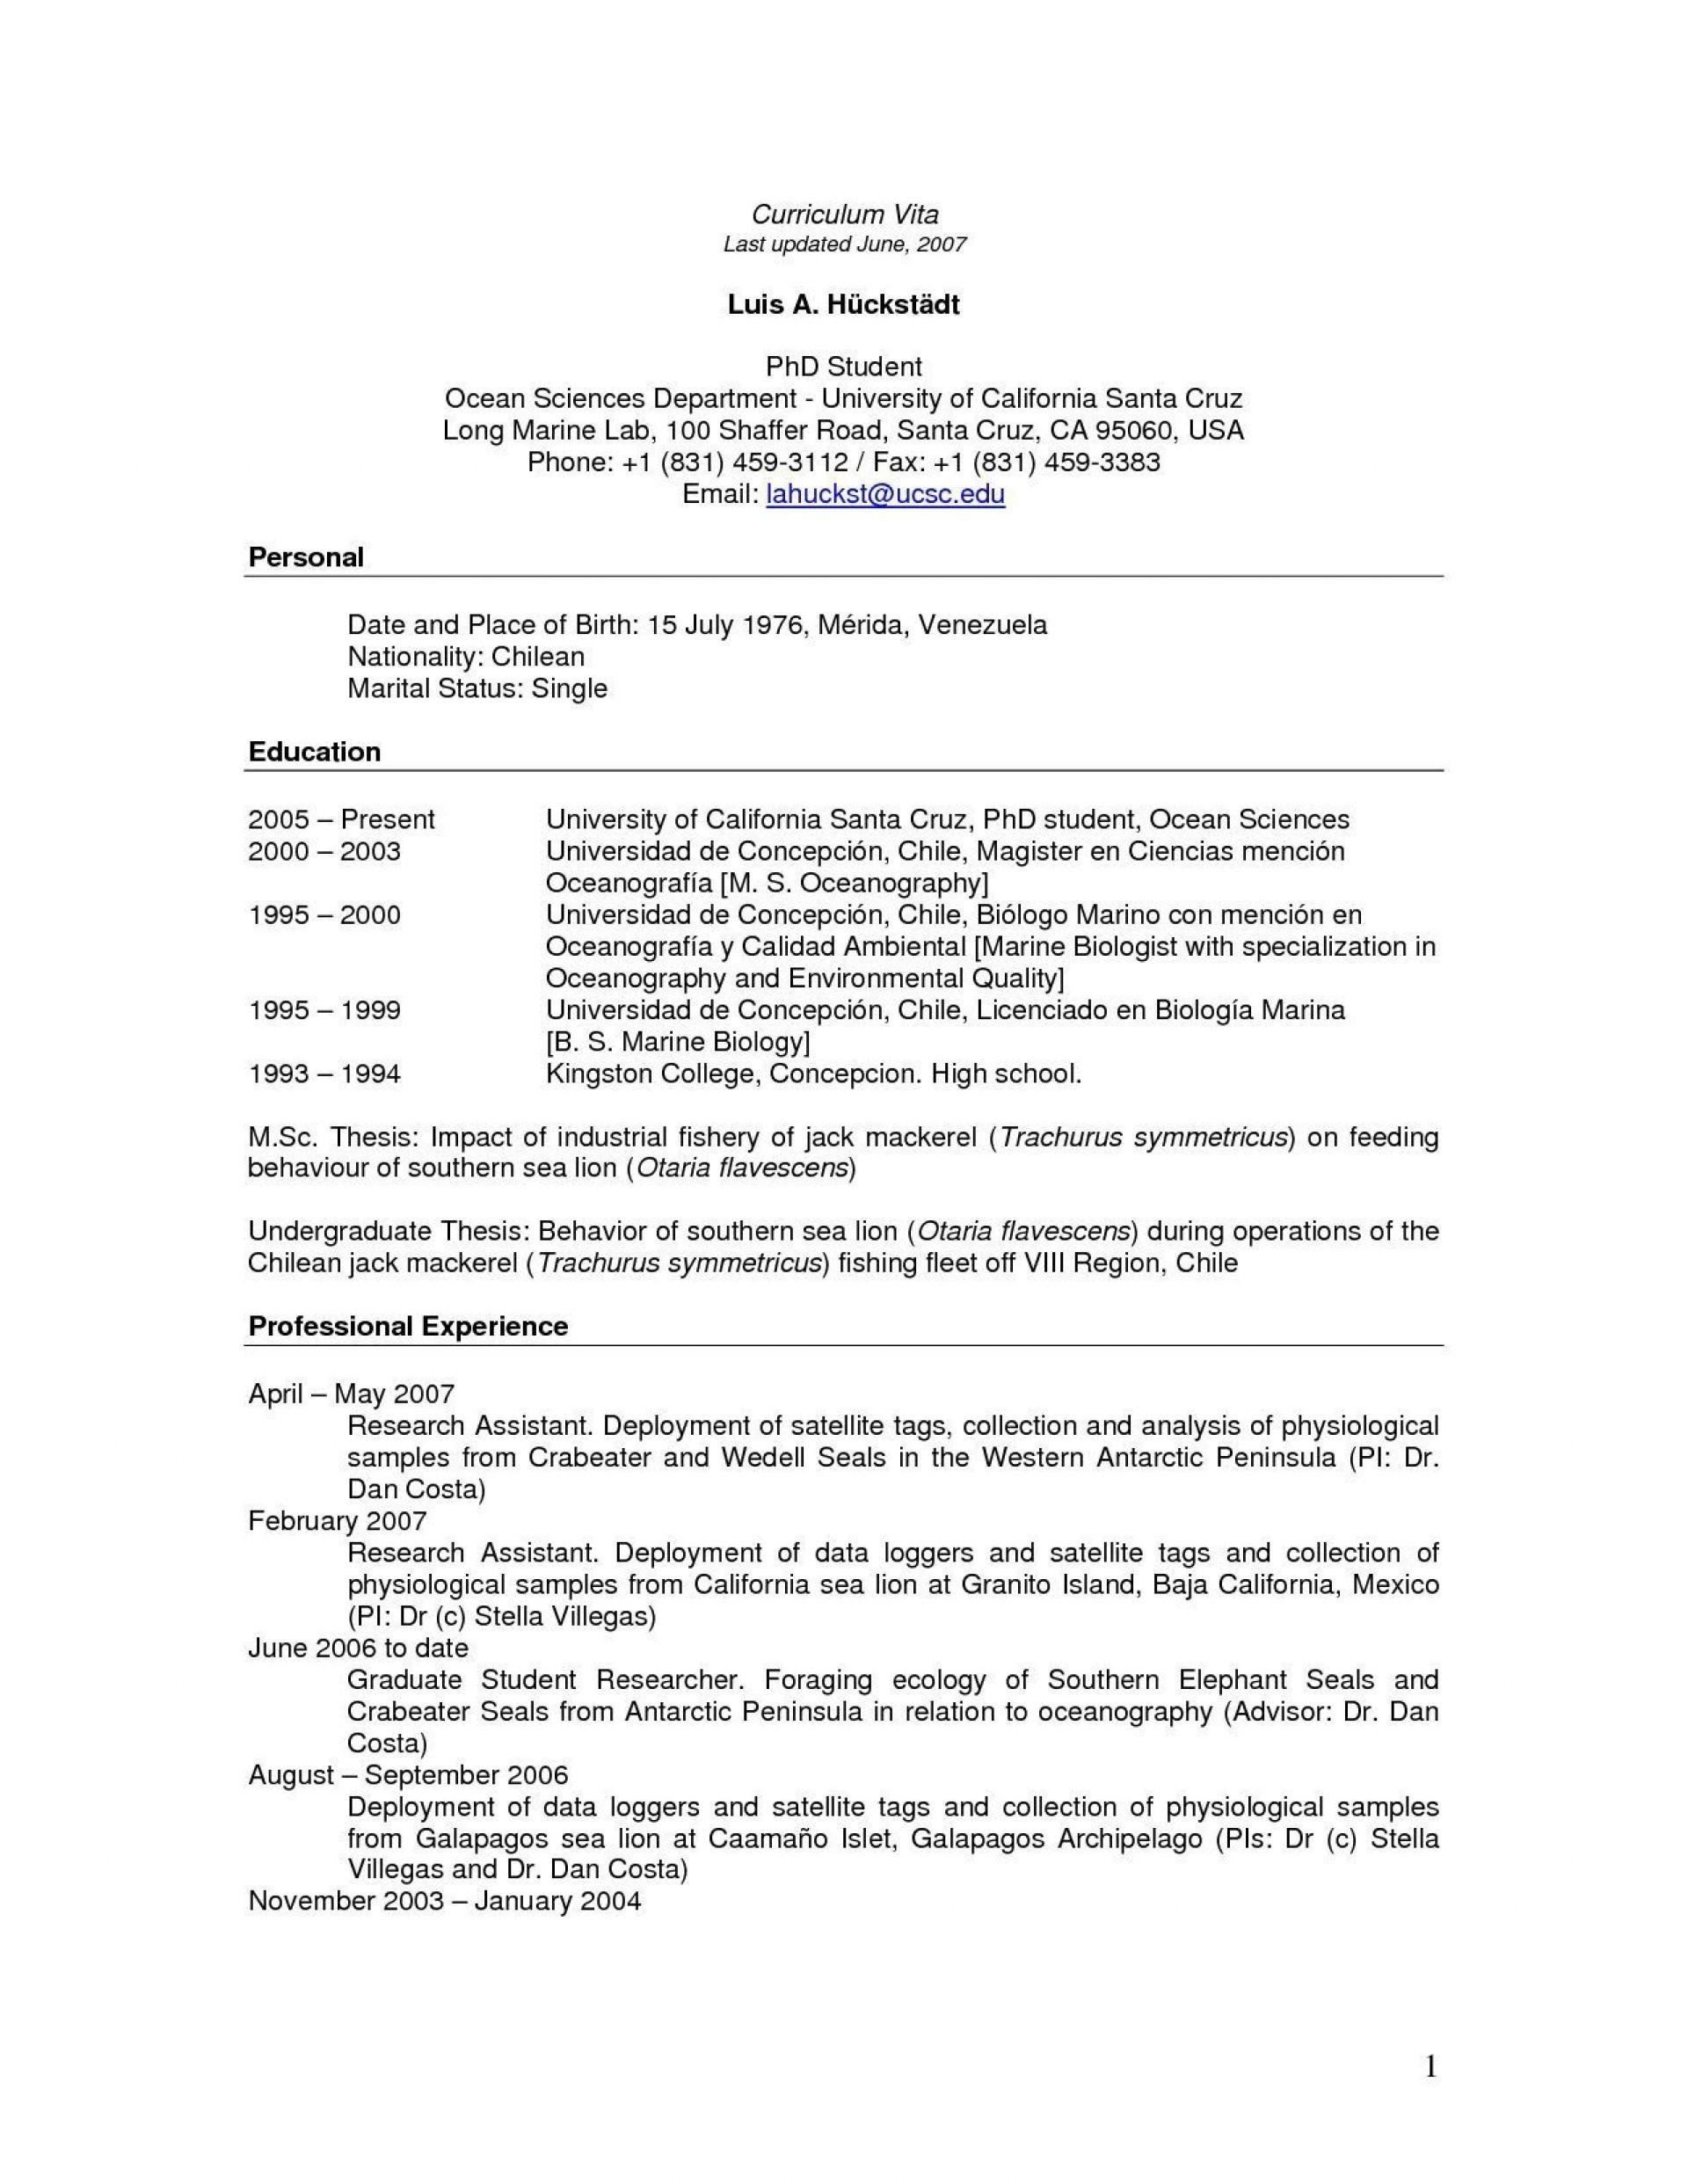 005 Excellent Grad School Resume Template Free Example 1920